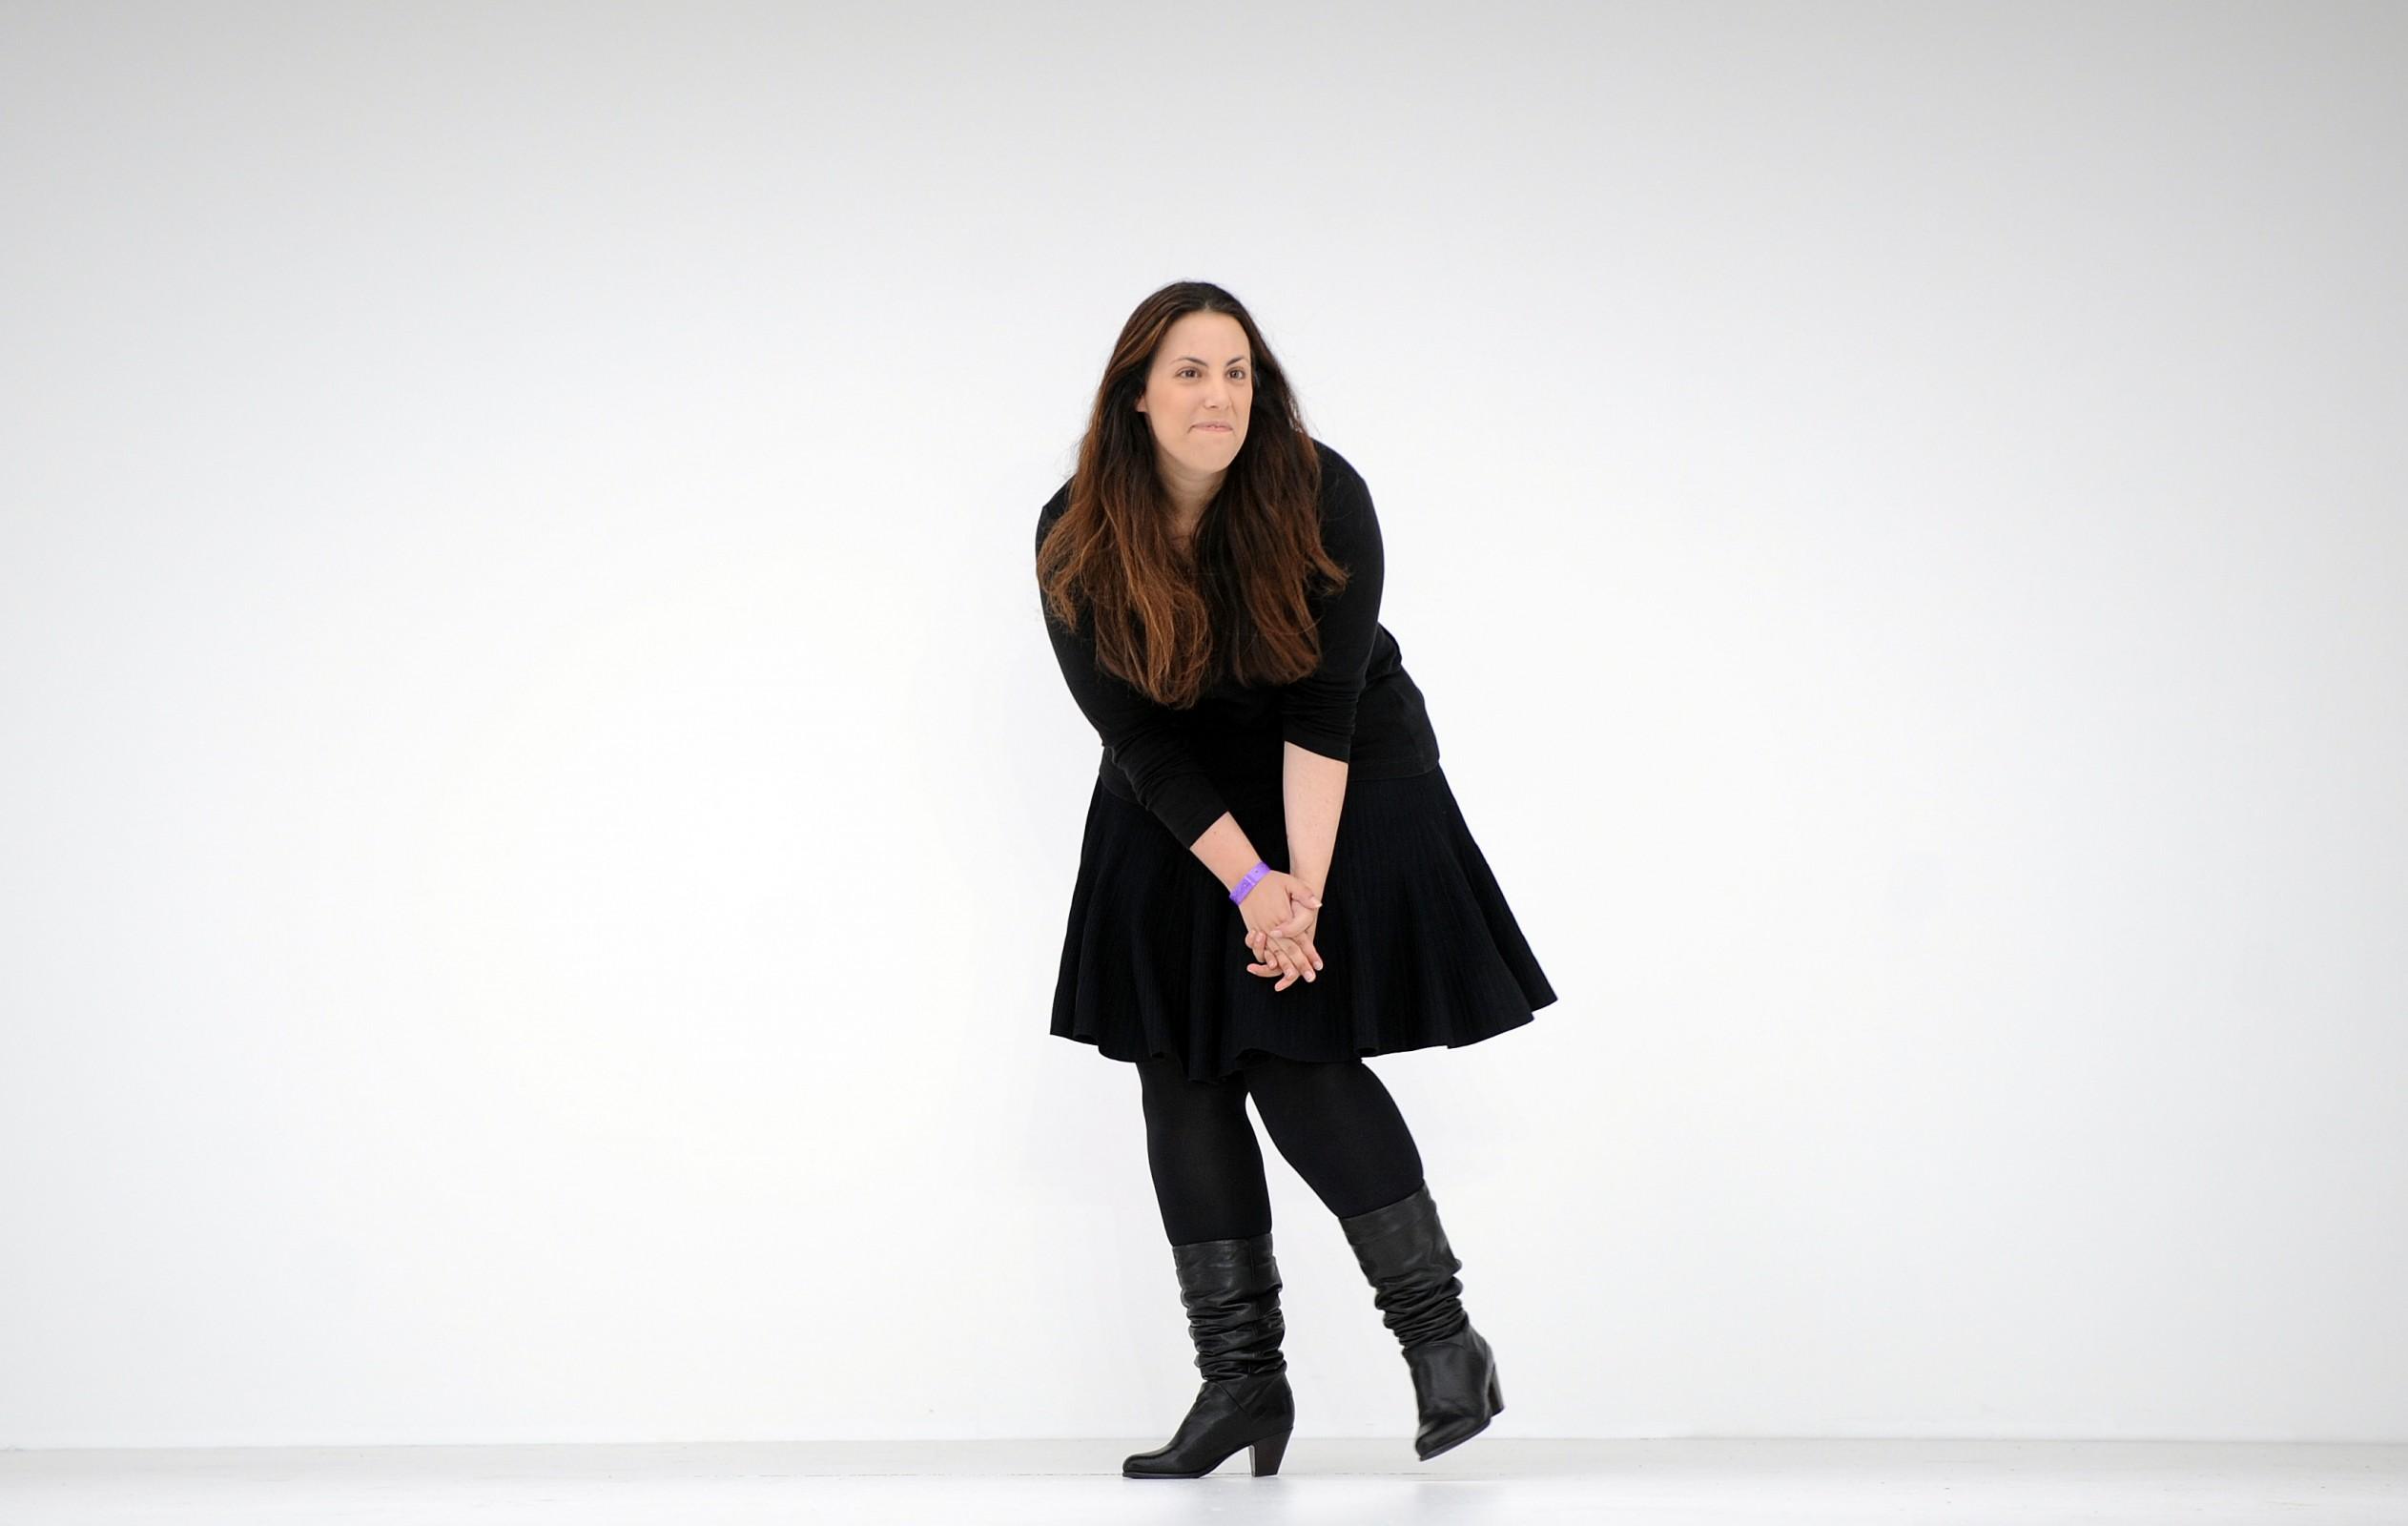 Mary Katrantzou: 2015 Fashion Fund Winner